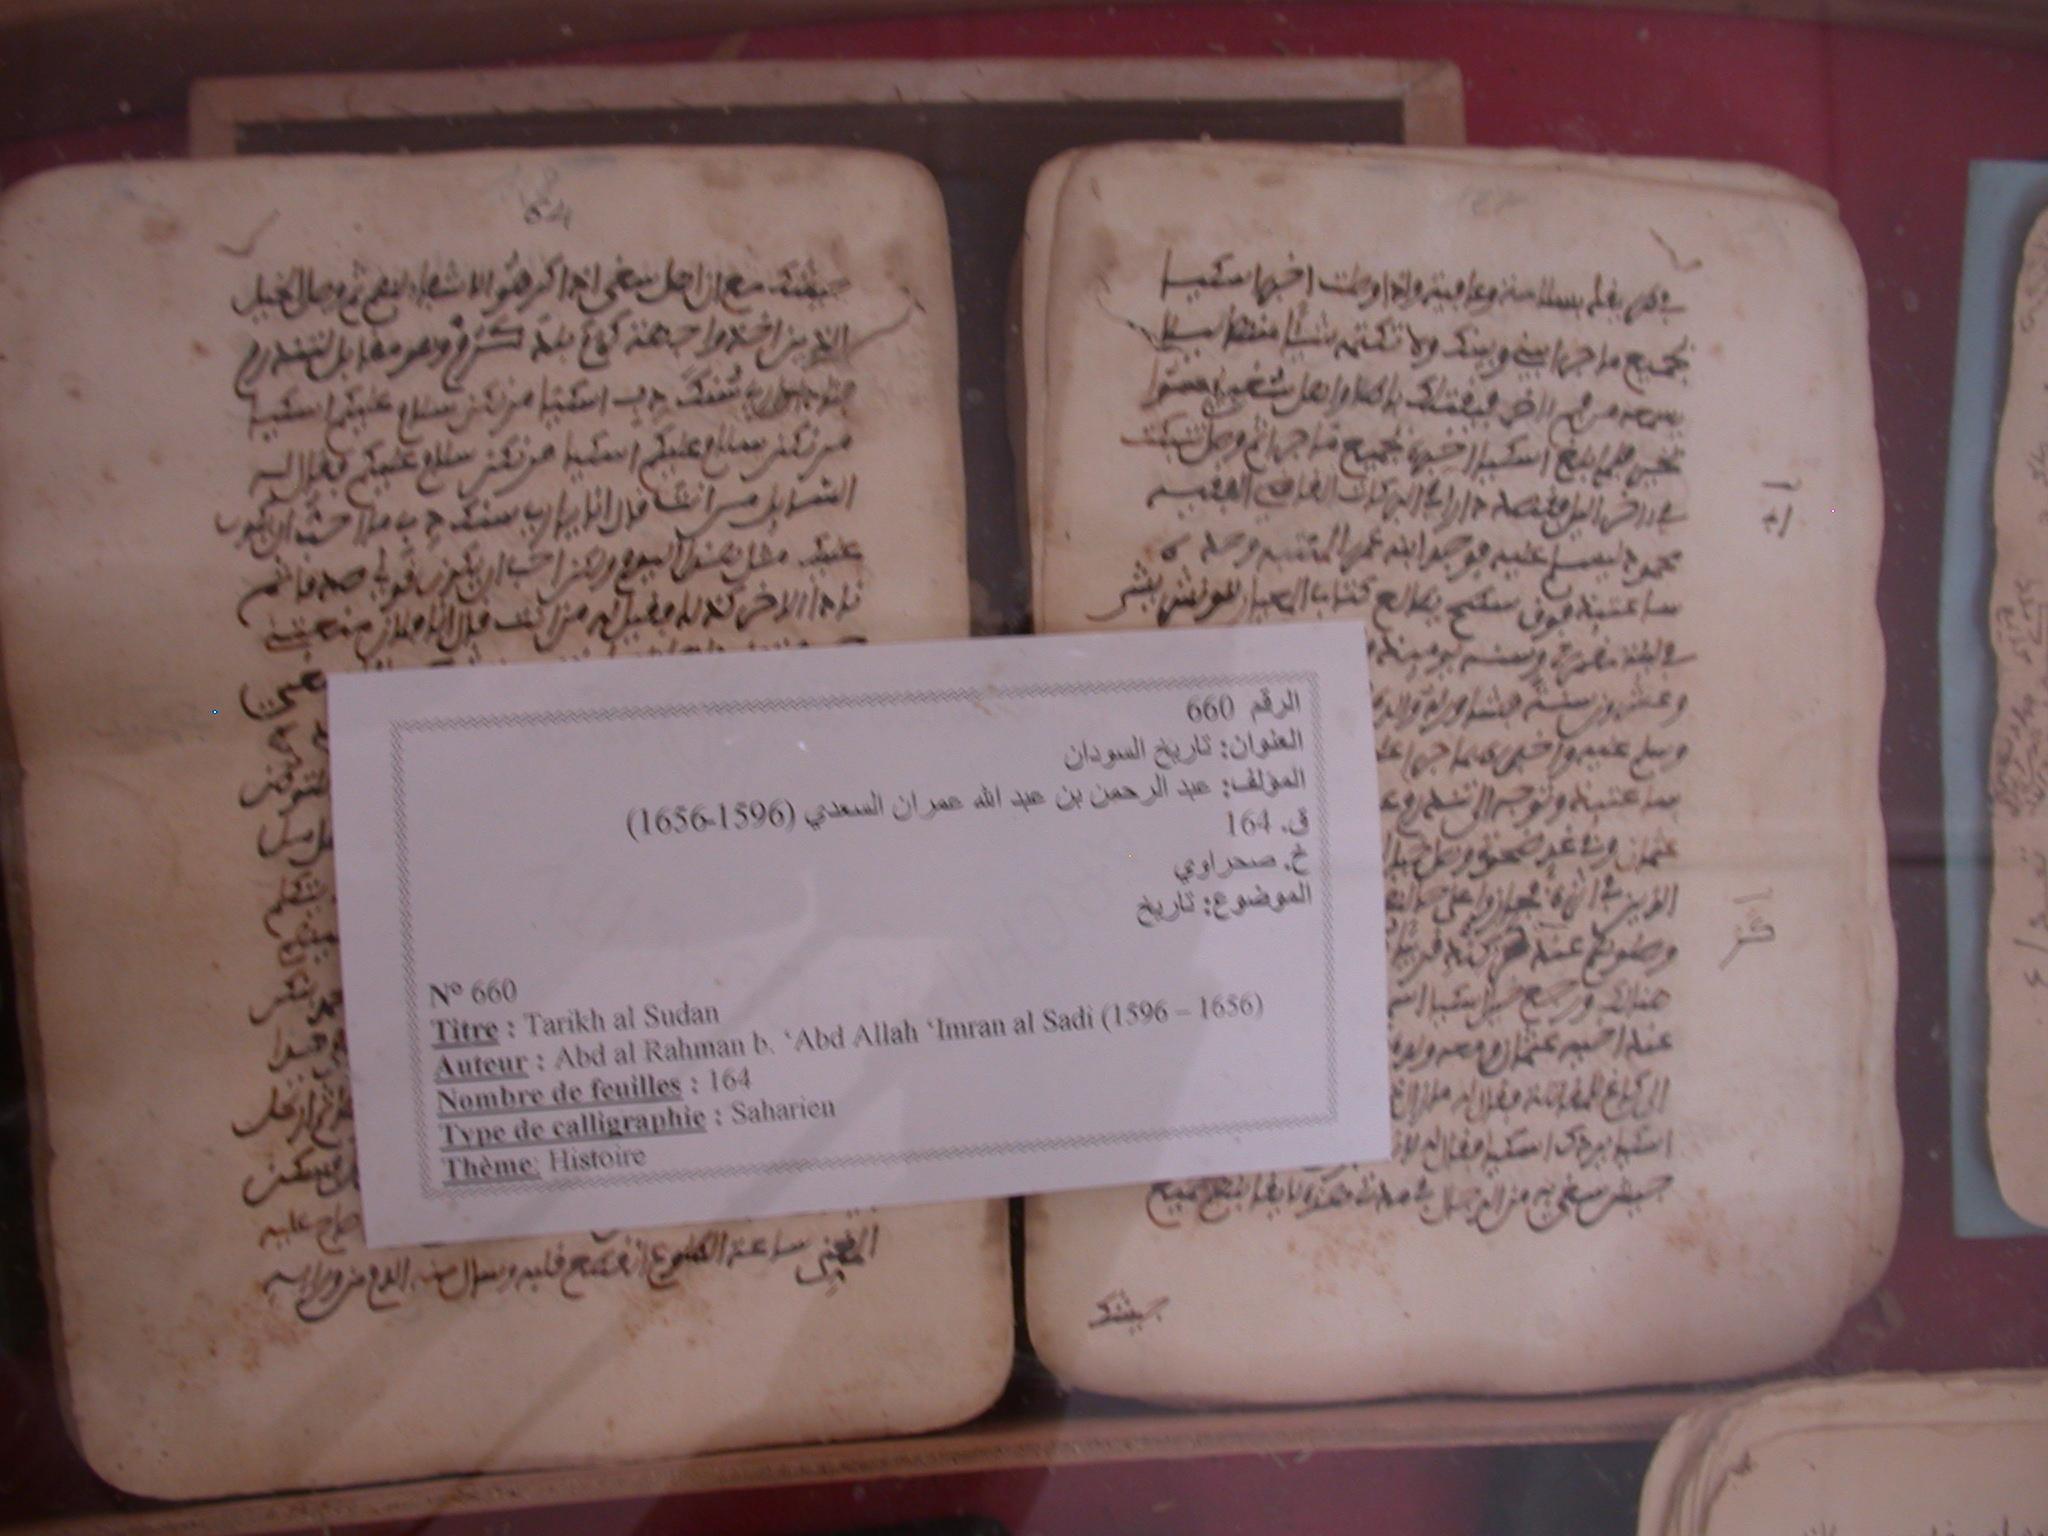 Manuscript, Tarikh al Sudan, Ahmed Baba Institute, Institut des Hautes Etudes et de Recherches Islamiques, Timbuktu, Mali